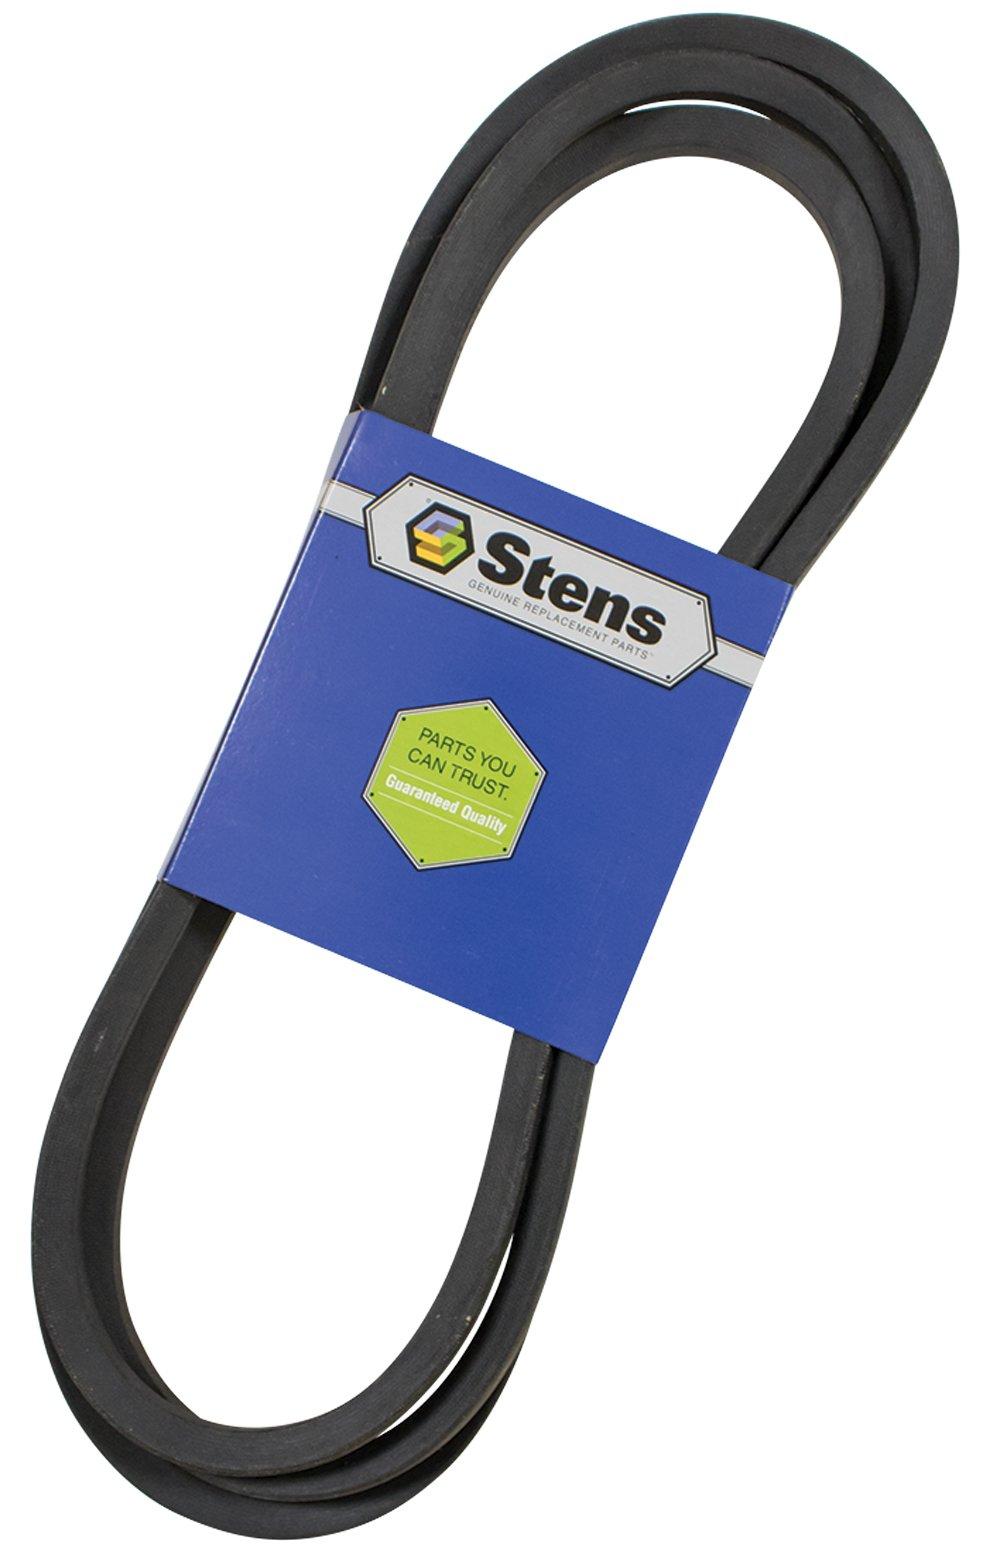 Stens 265-344 OEM Replacement Belt/Ferris 5021297